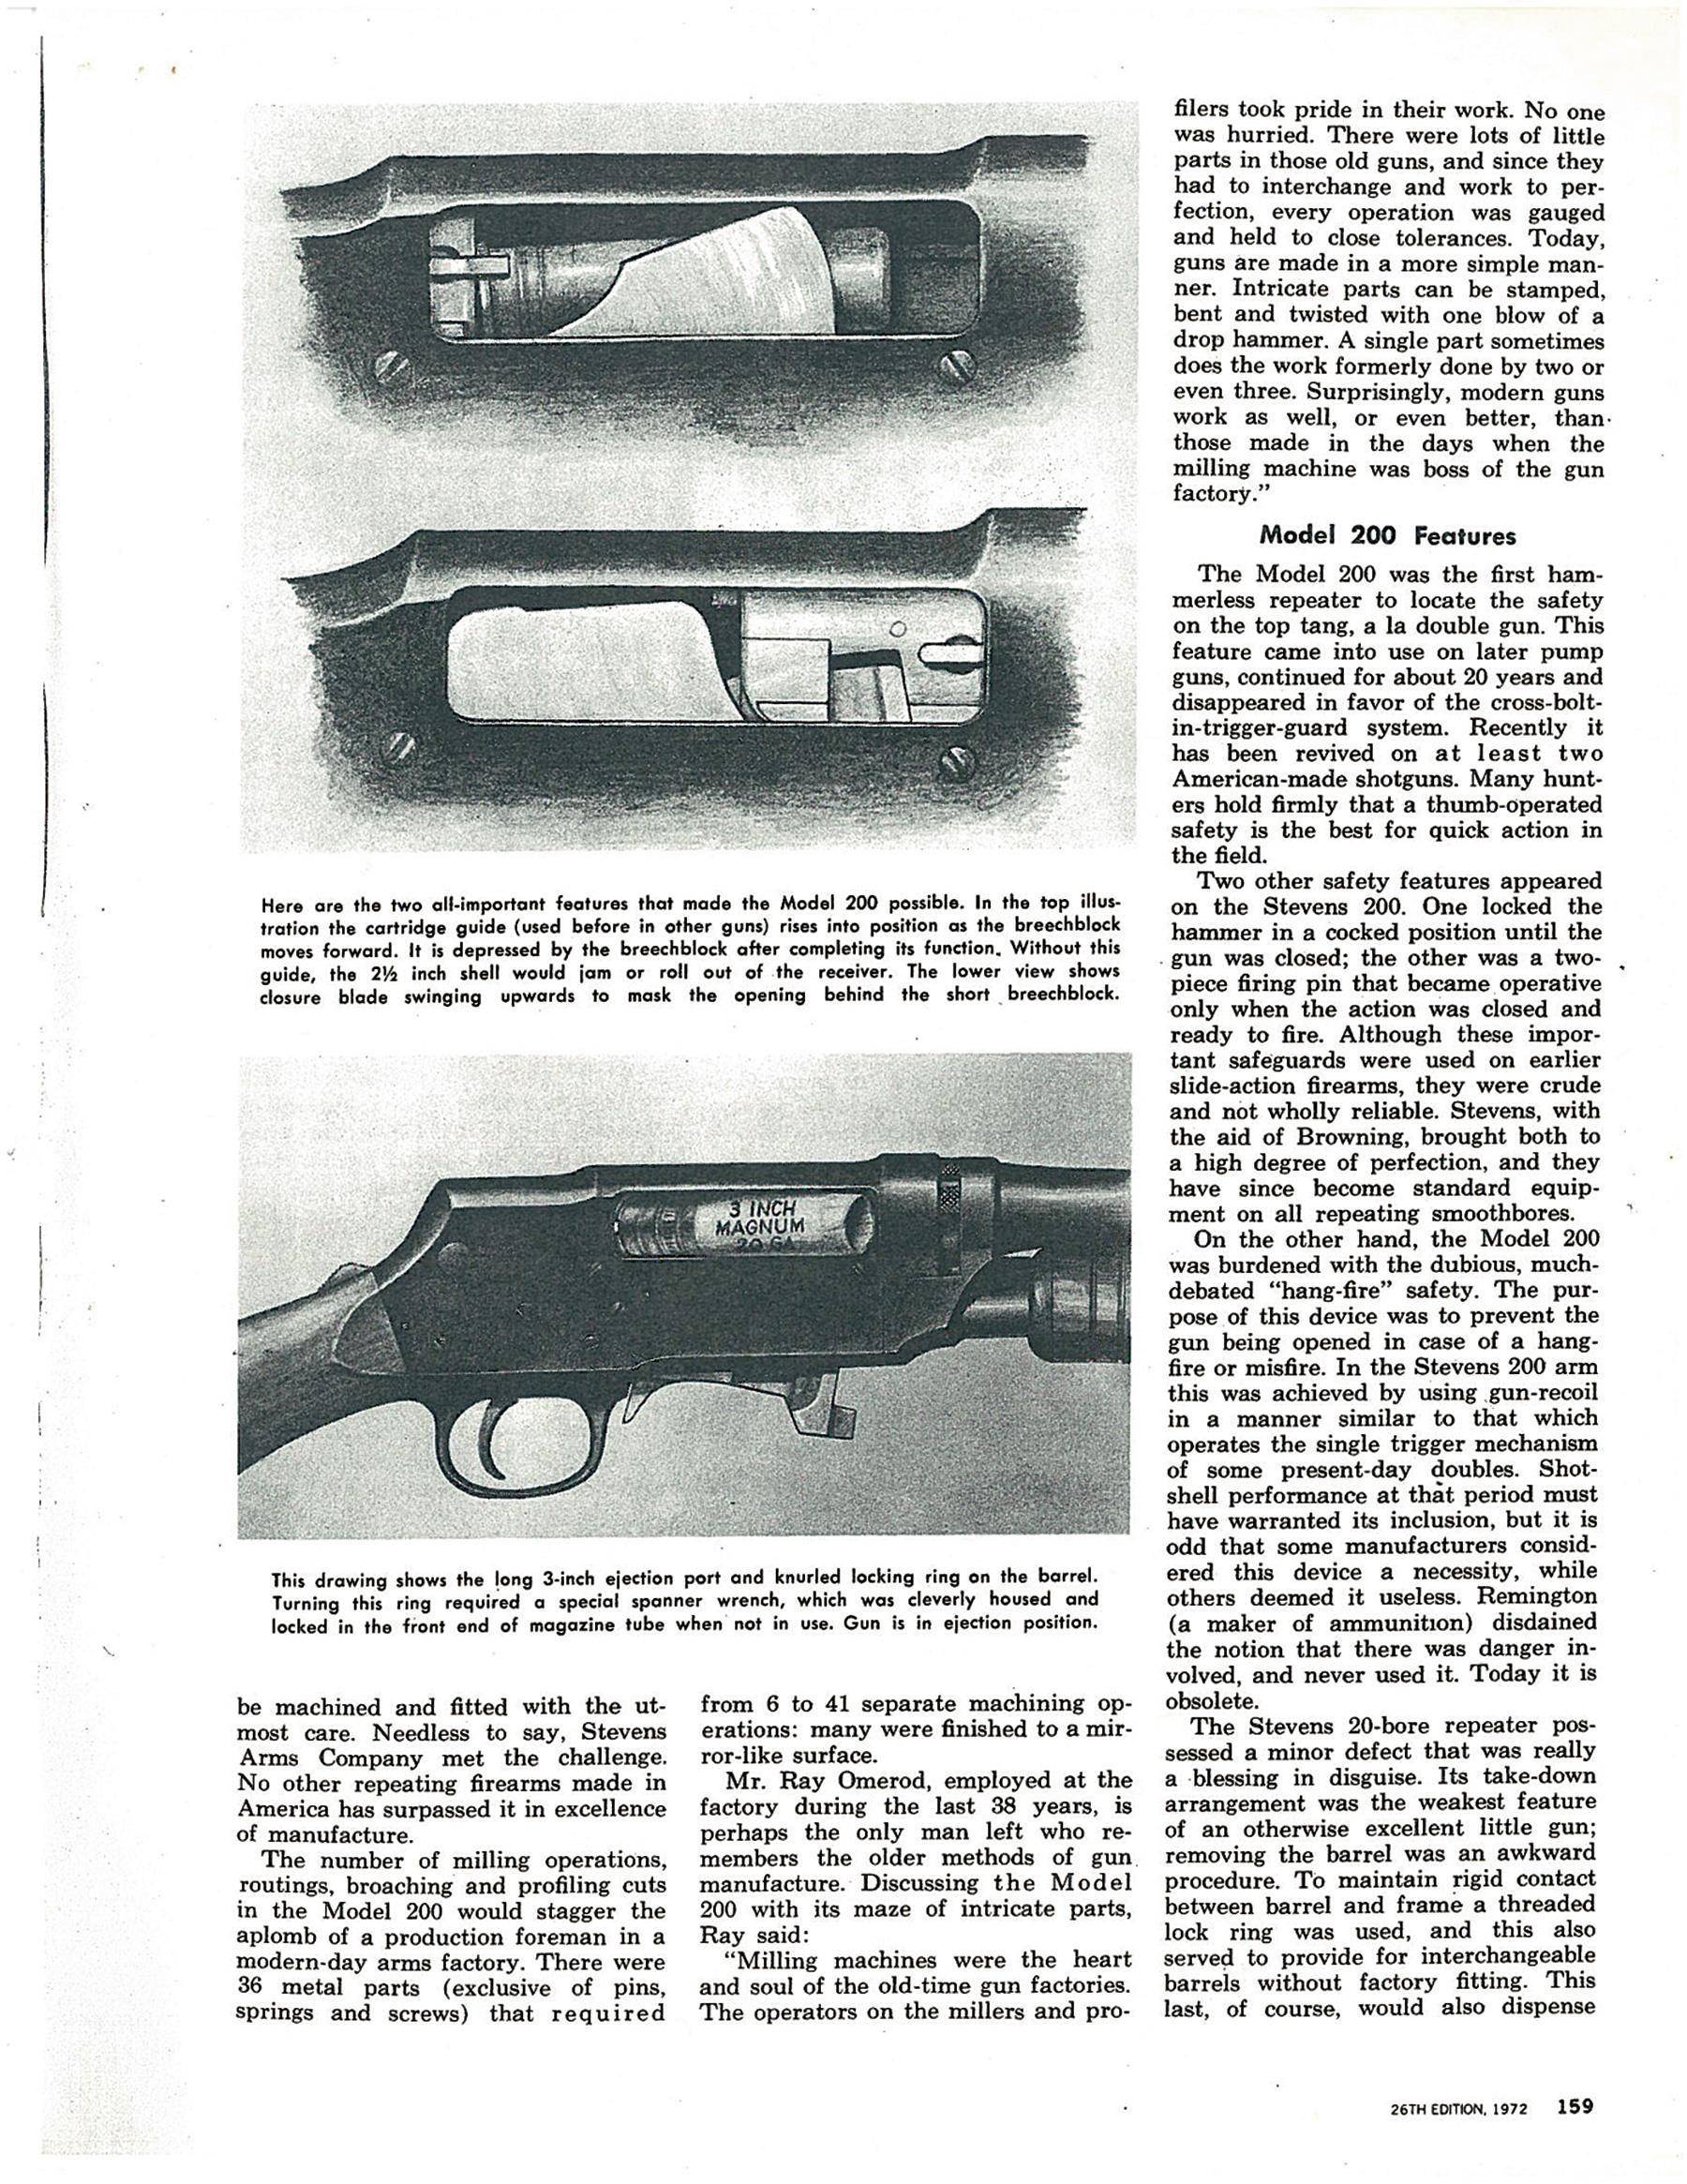 Pin on Stevens No. 200 20 gauge pump shotgun